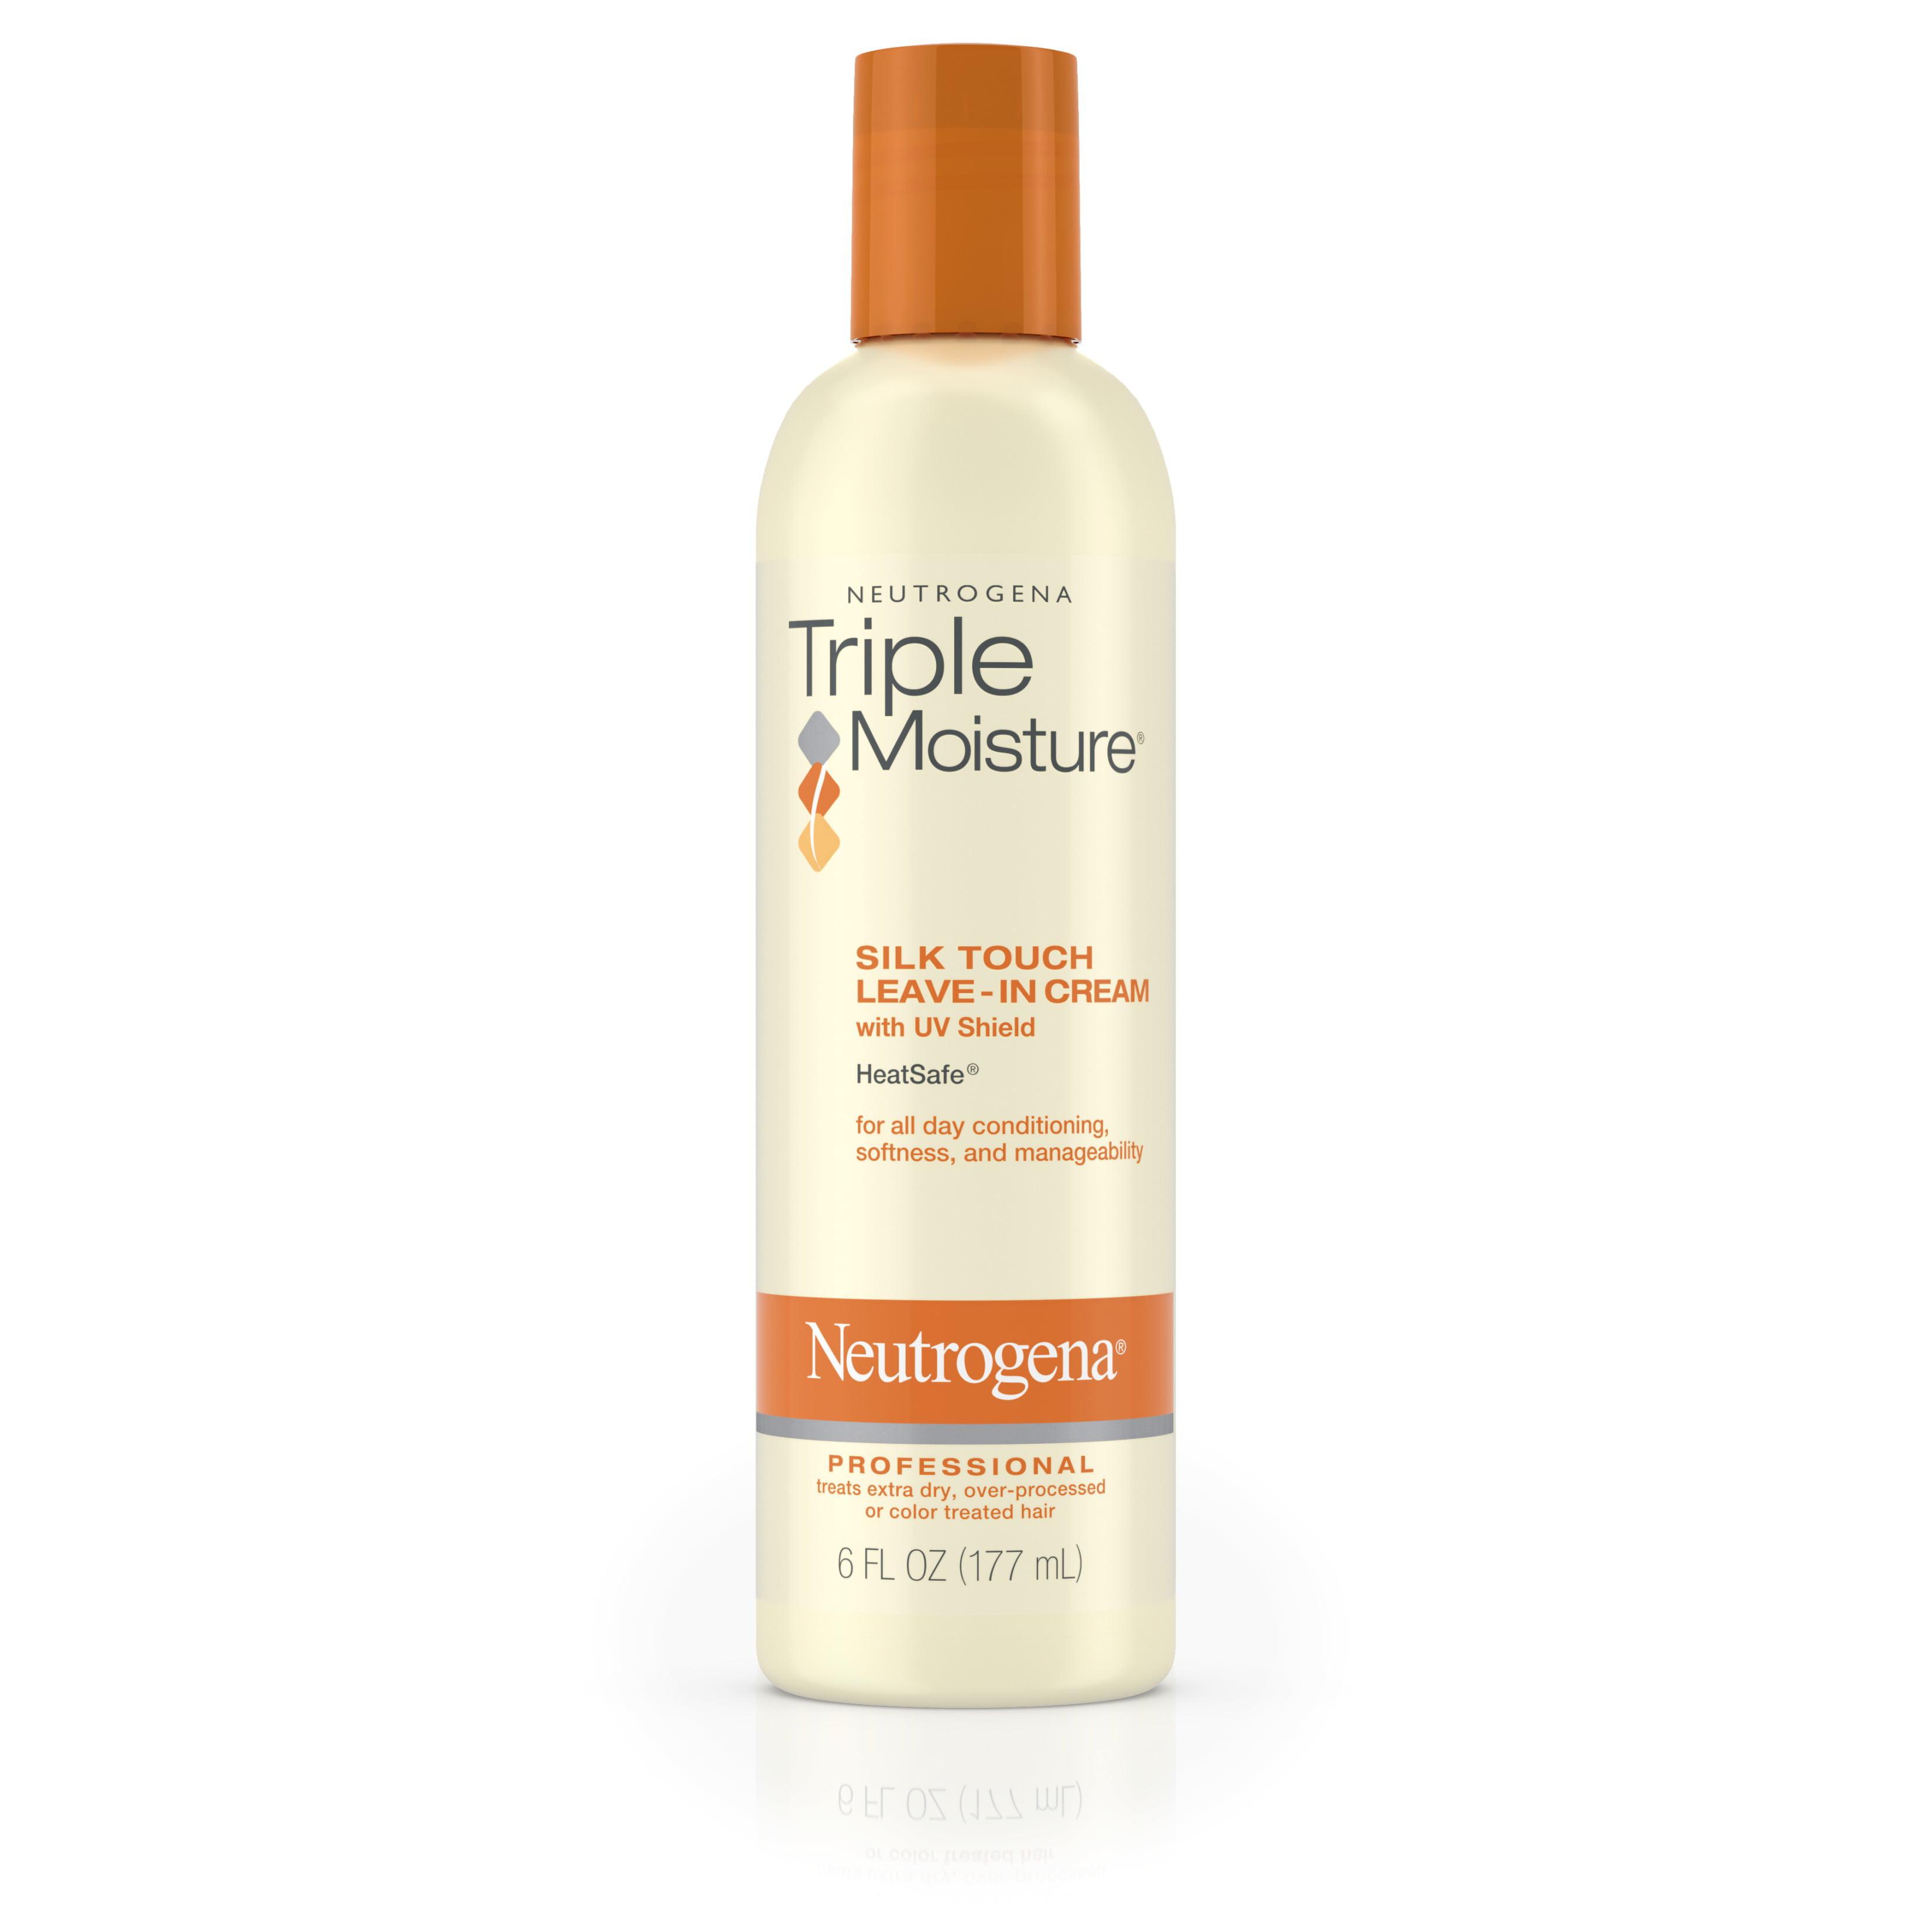 Neutrogena Triple Moisture Silk Touch Leave-In Cream For Dry And Damaged Hair, 6 Fl. Oz. - Walmart.com